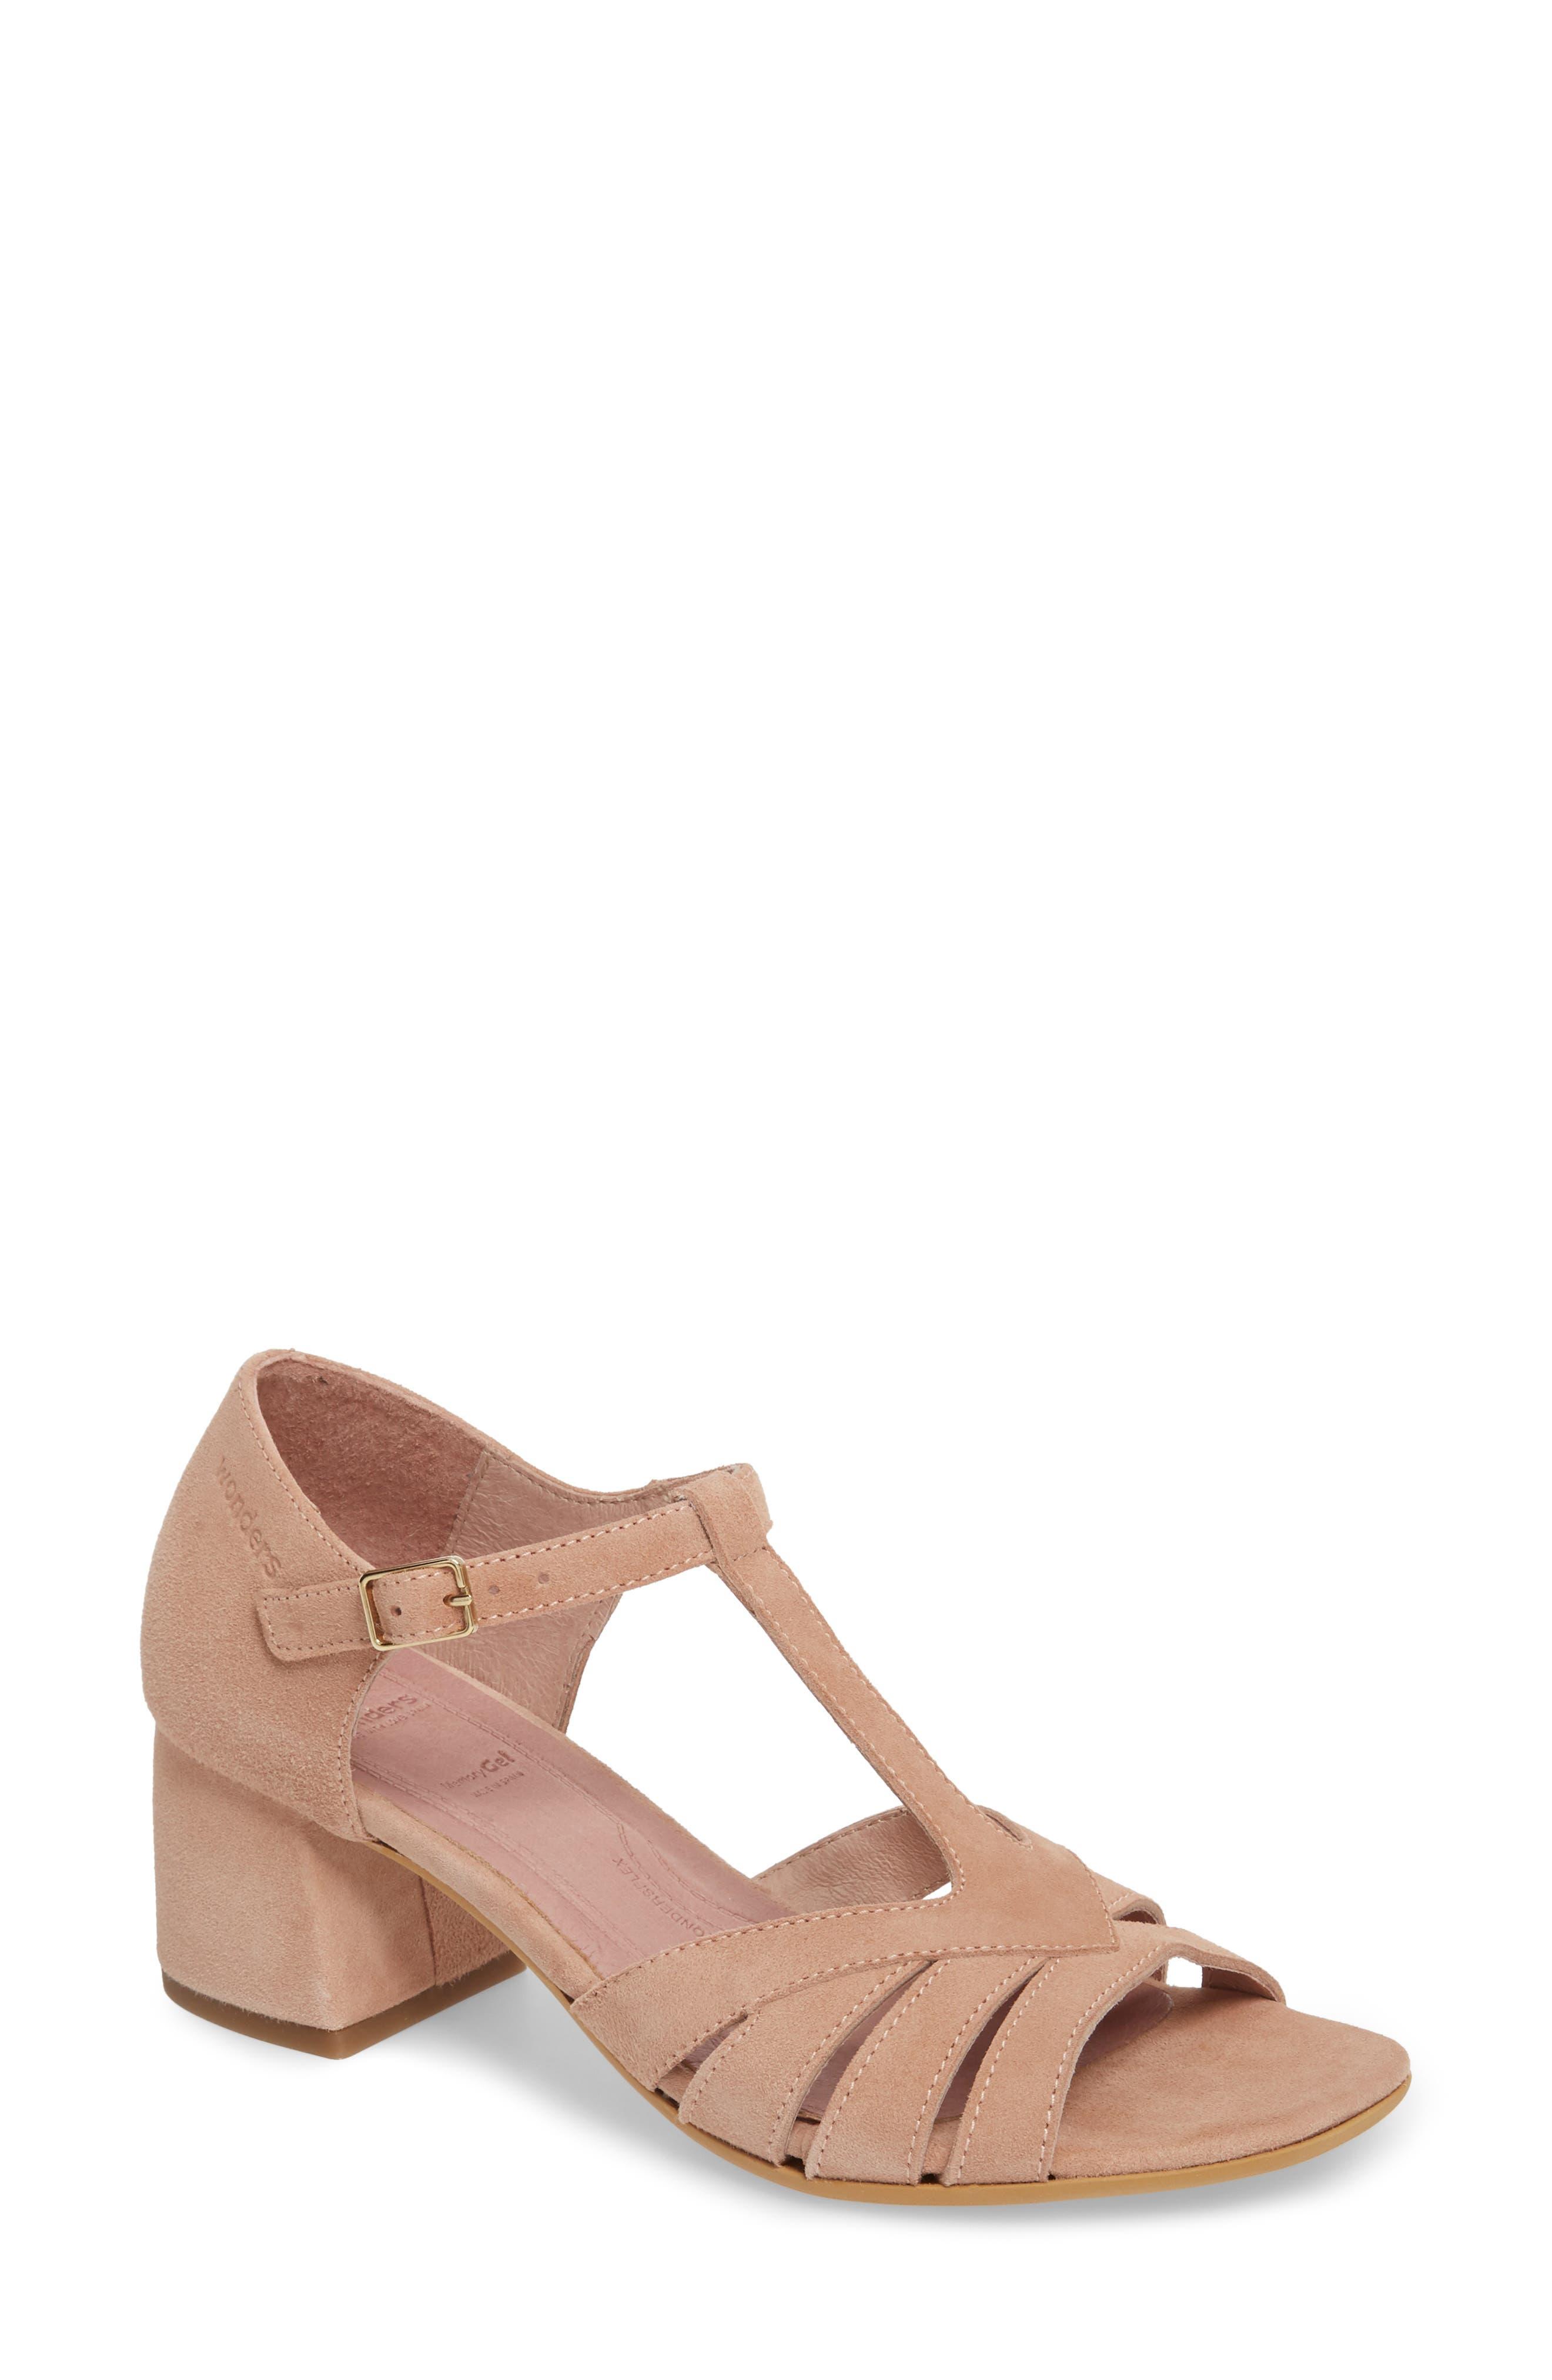 Block Heel Sandal,                         Main,                         color, Nude Suede